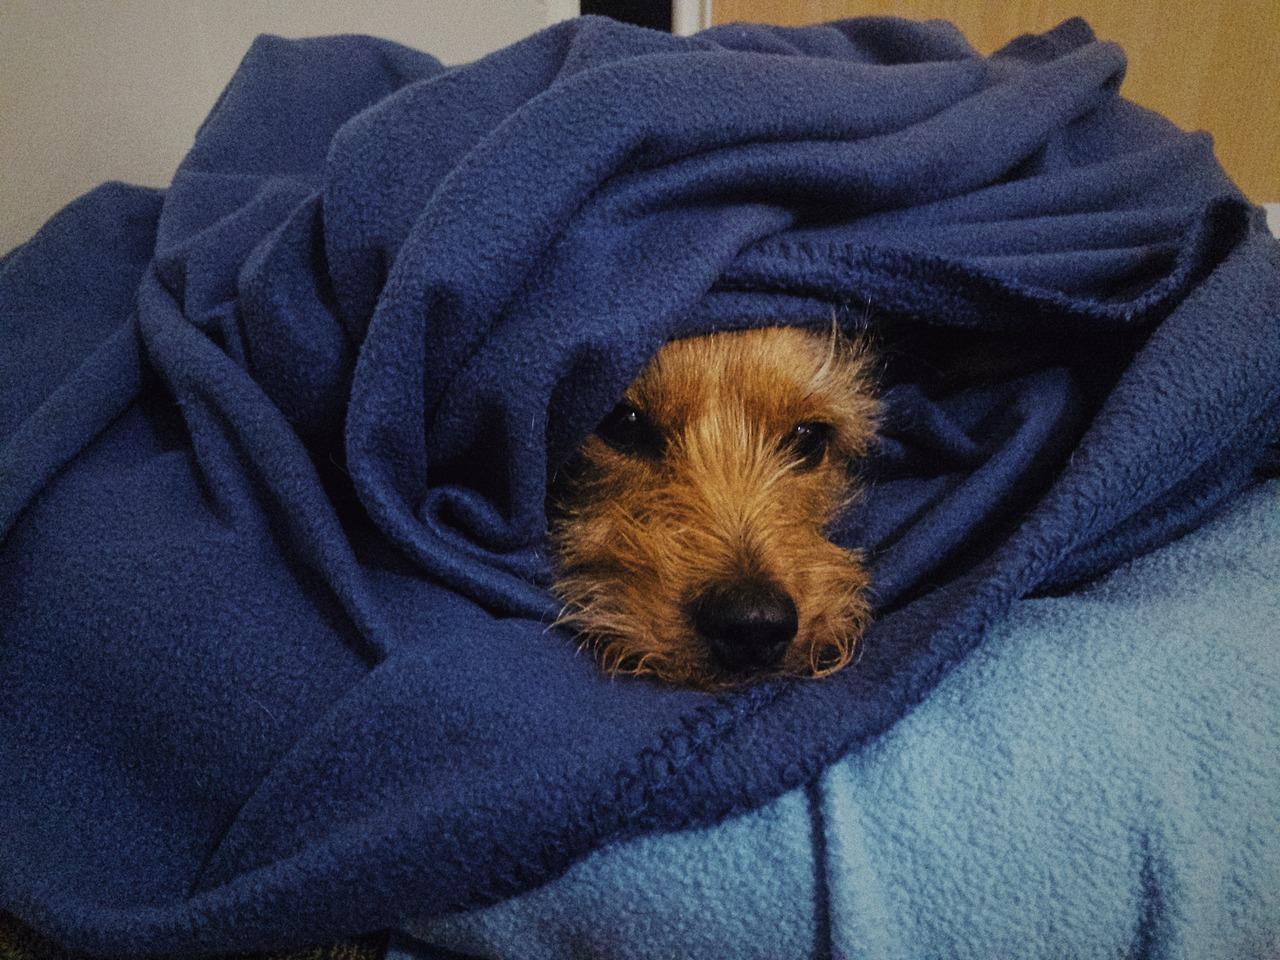 <p>Beanie sure made himself cozy overnight.</p>